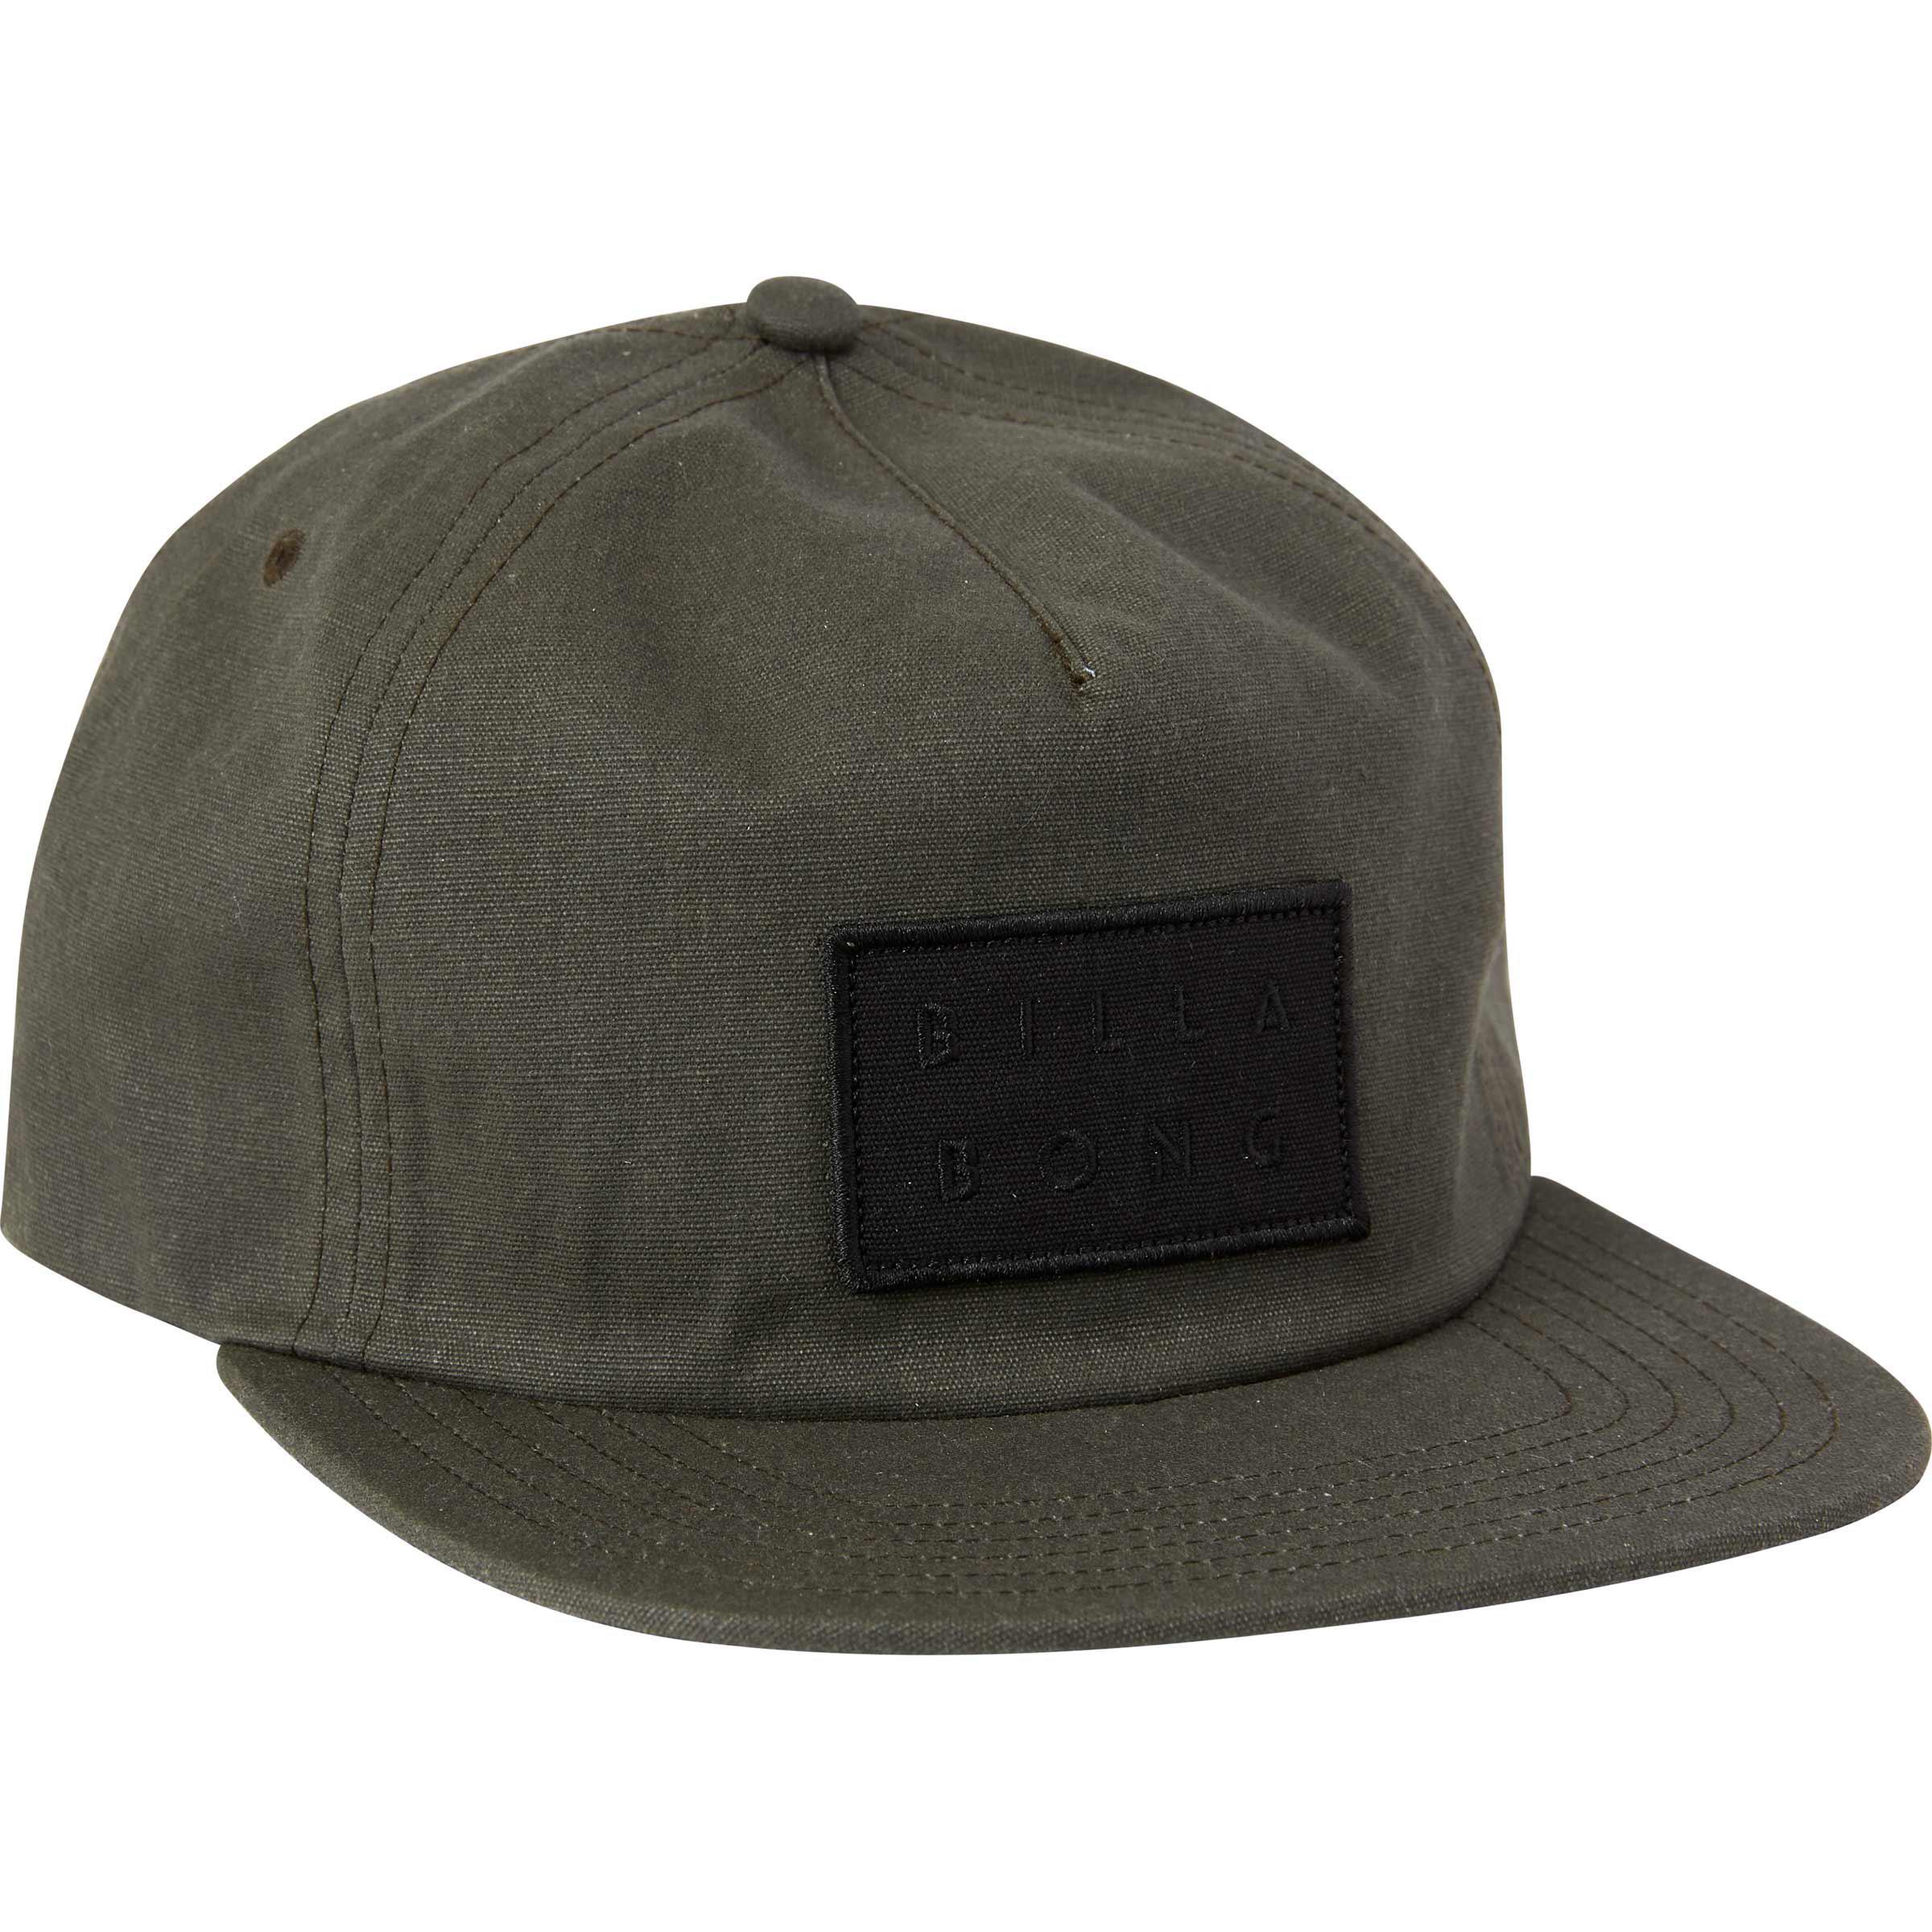 02c9be543065e Billabong Die Cut Hat in Green for Men - Lyst